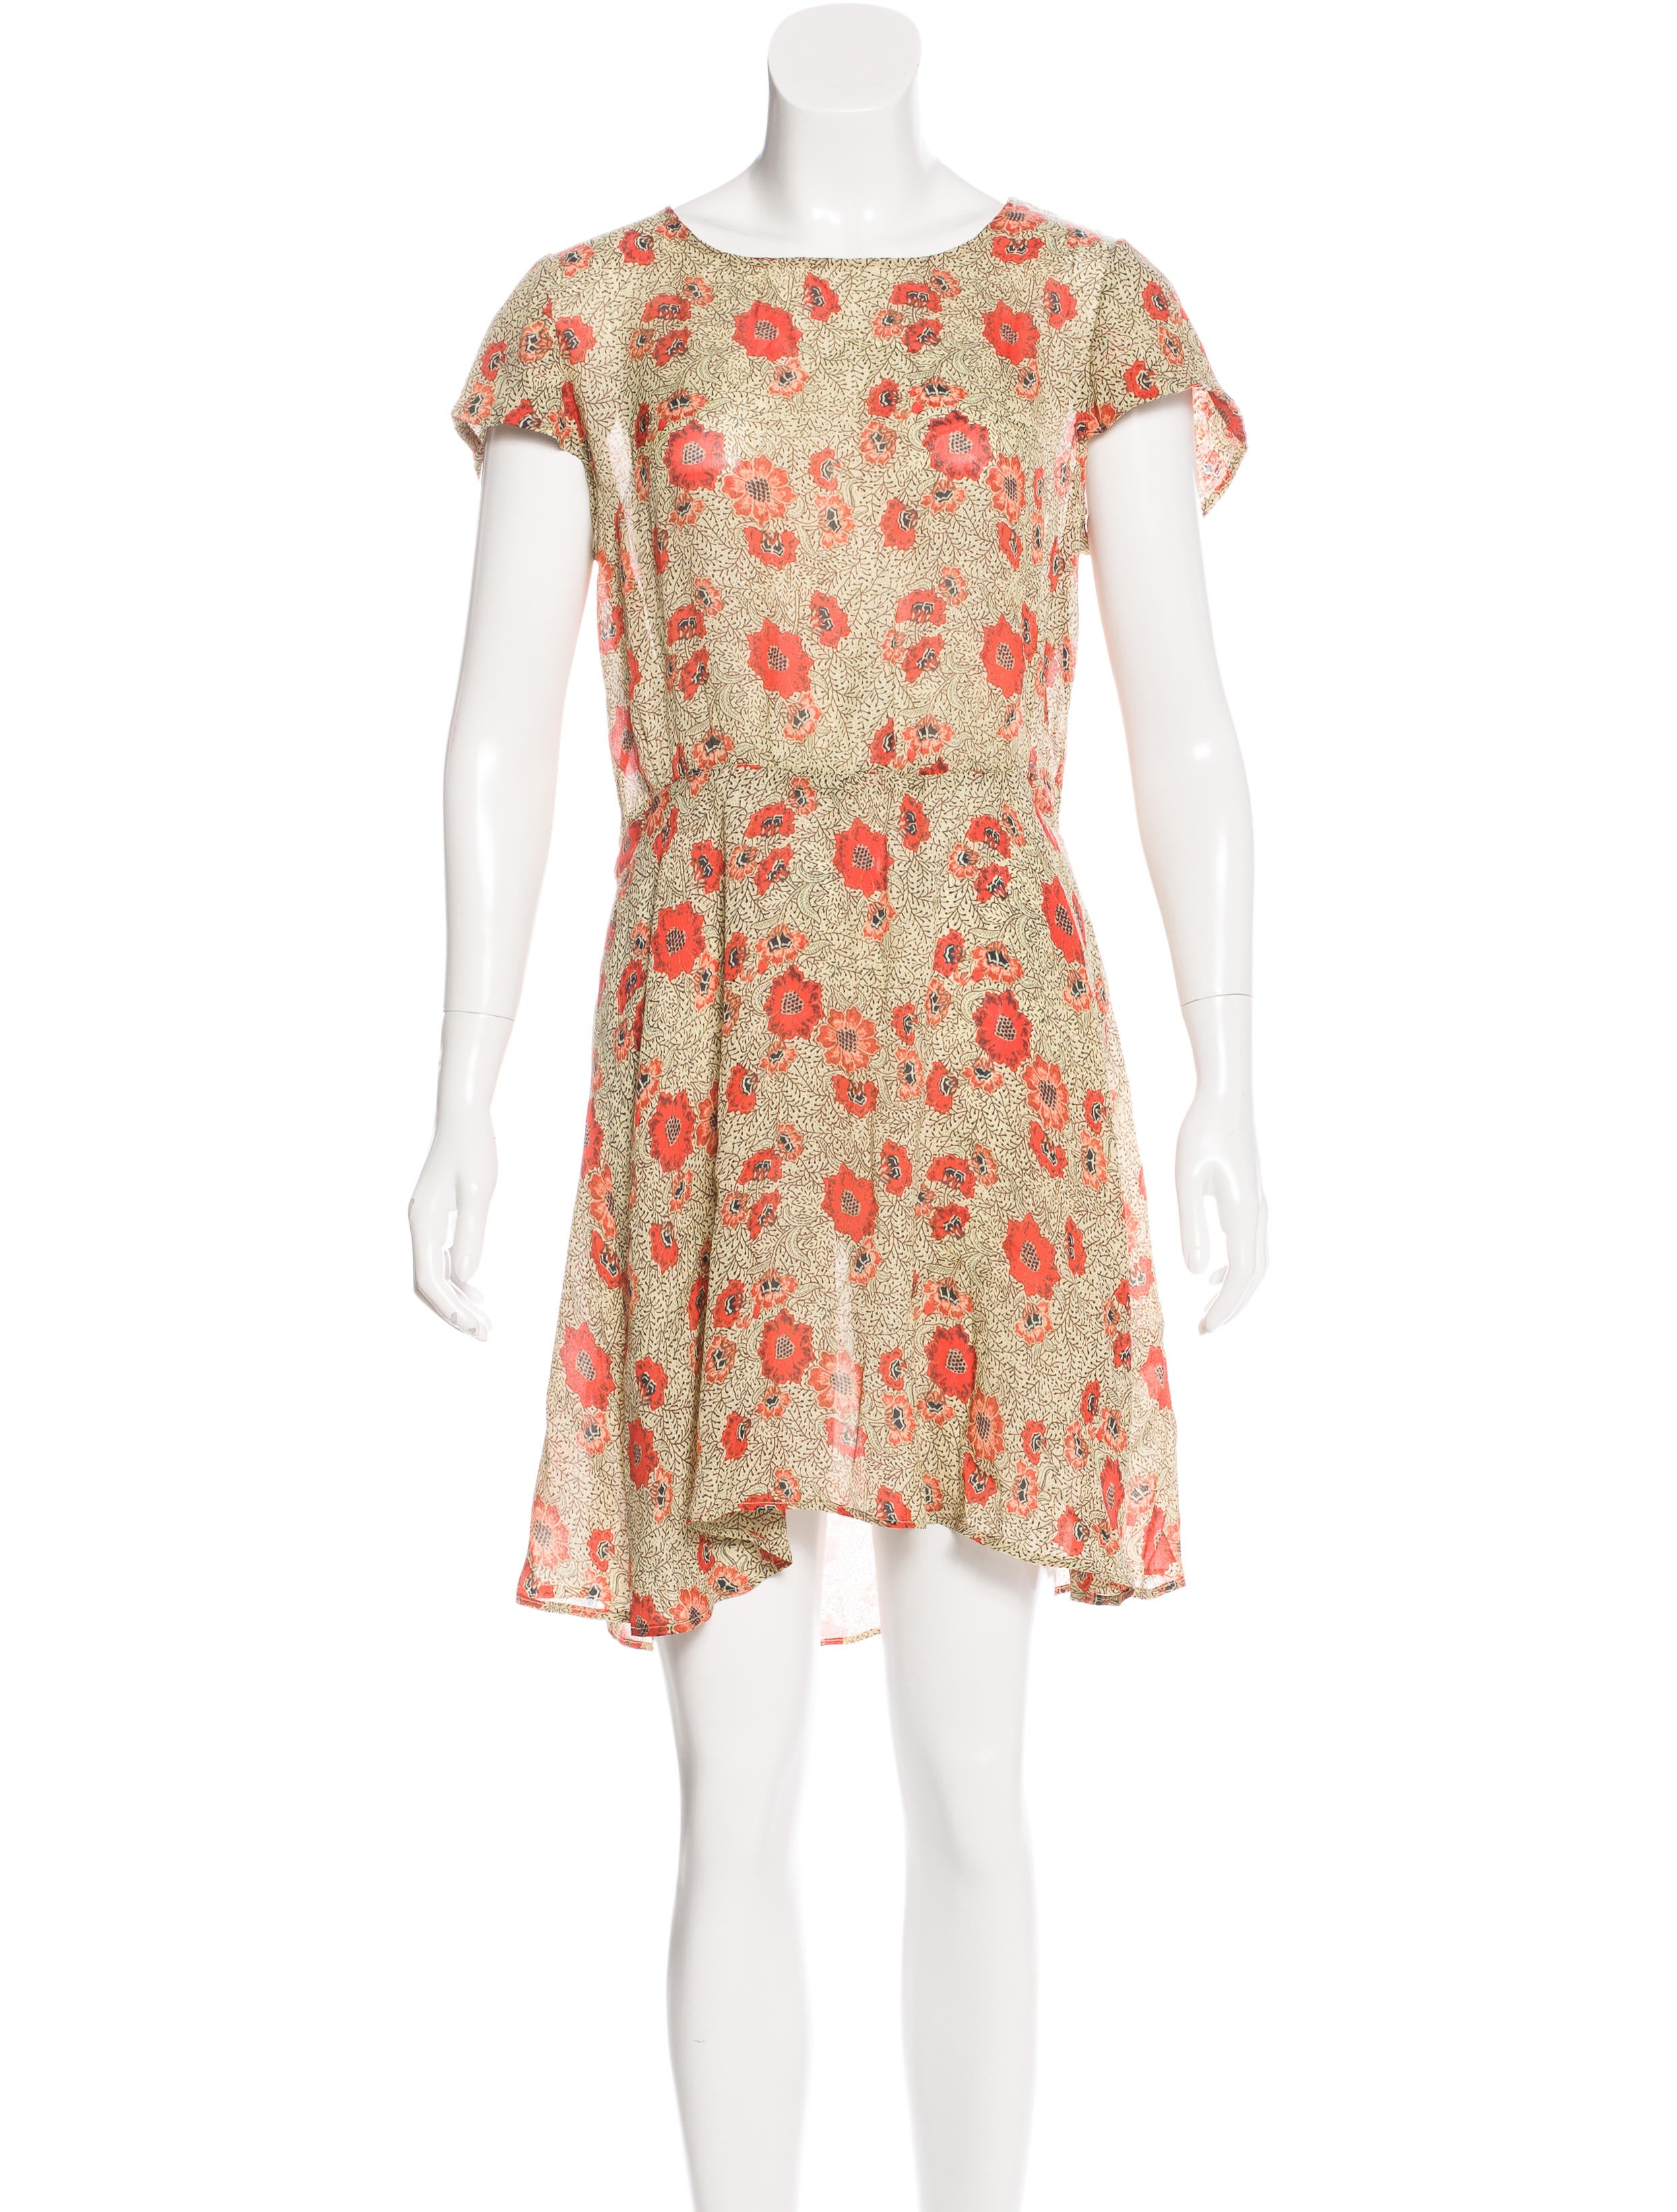 Toile isabel marant silk printed dress clothing for Isabel marant shirt dress